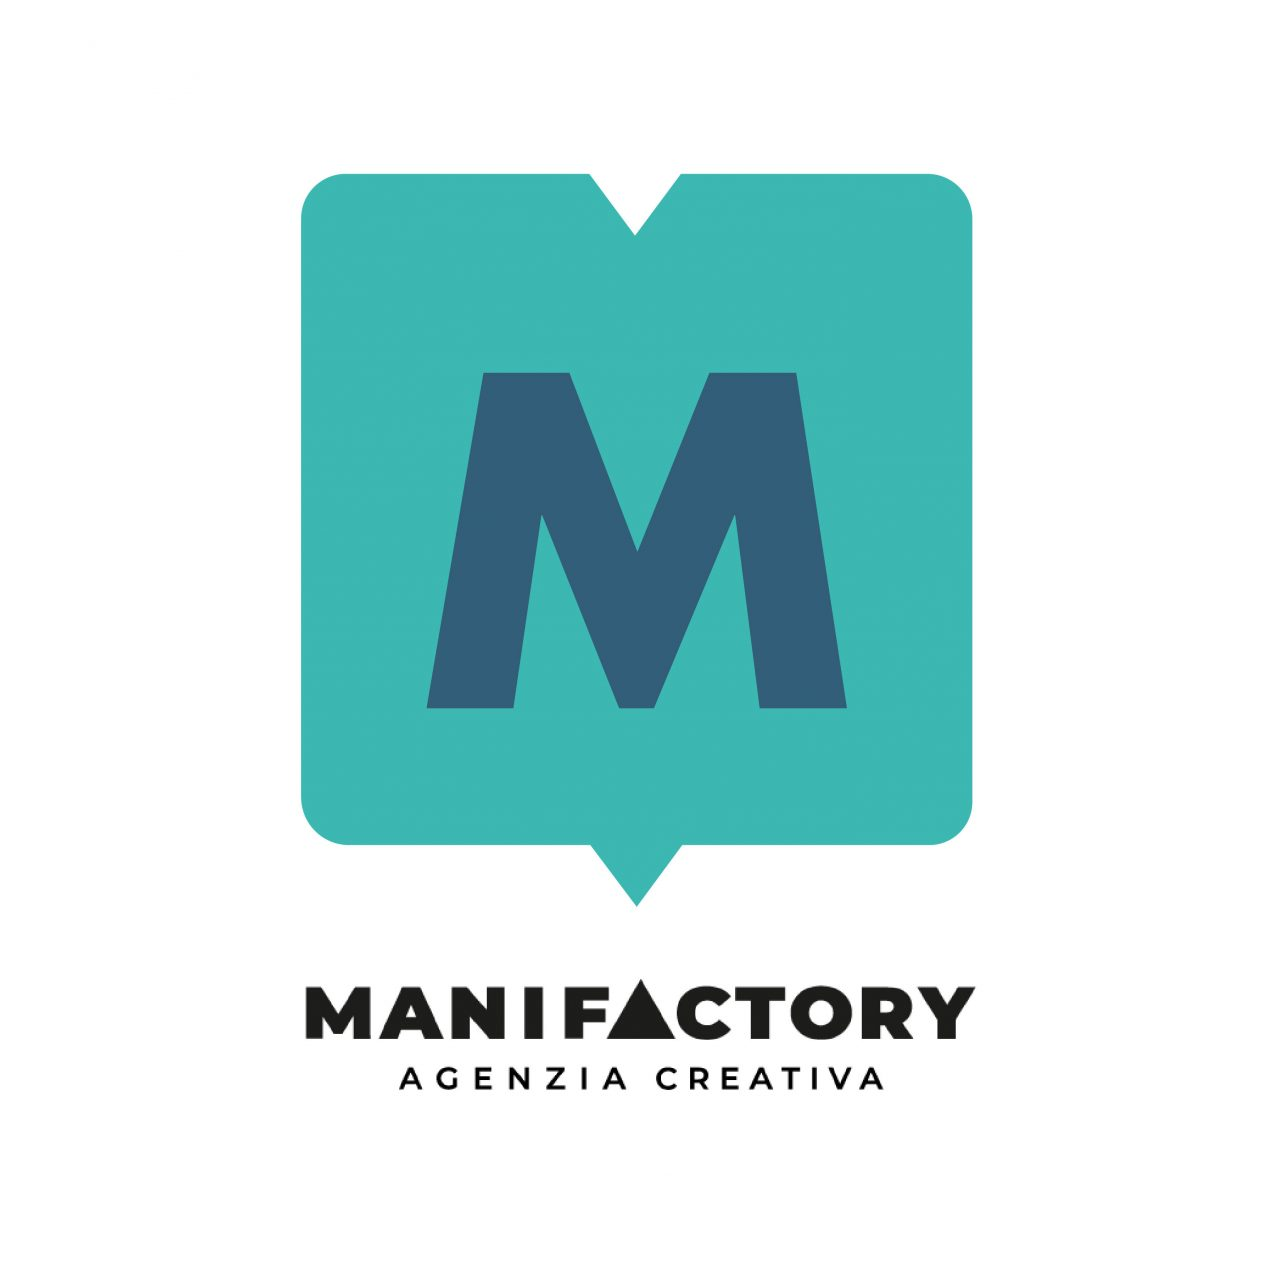 logo Manifactory agenzia di comunicazione